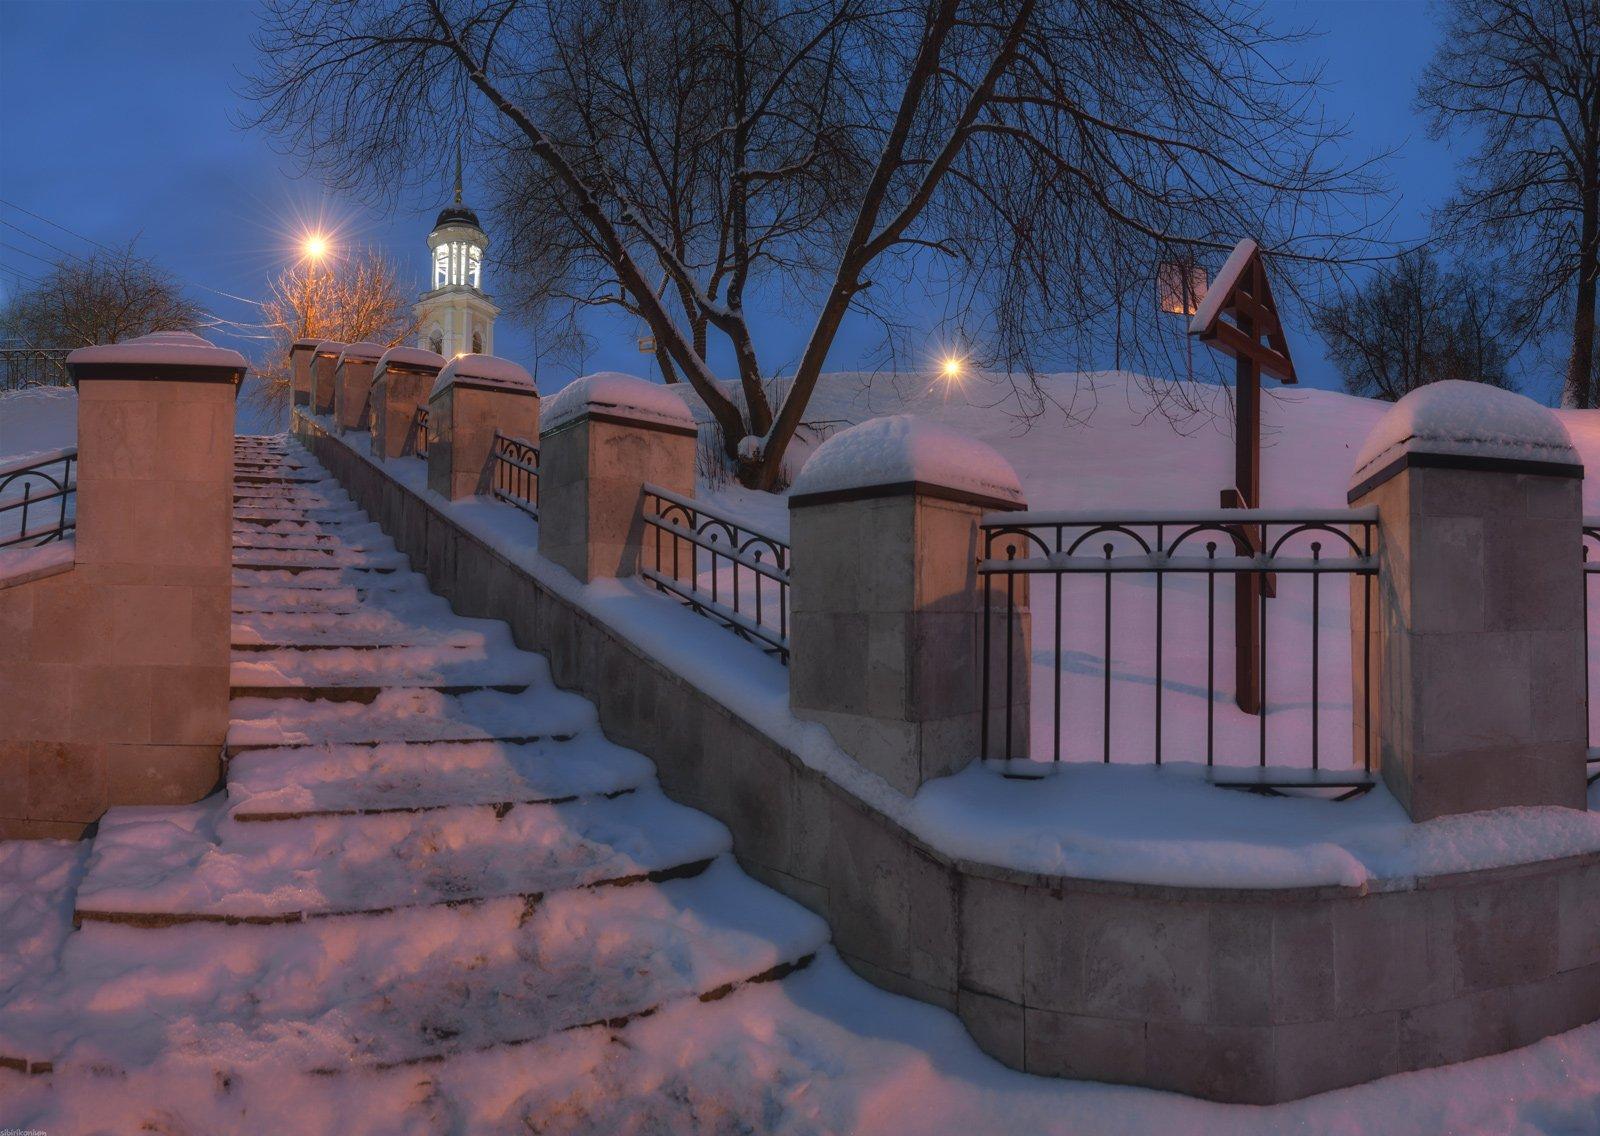 церковь храм архитектура пейзаж ночь лестница, Морозов Юрий